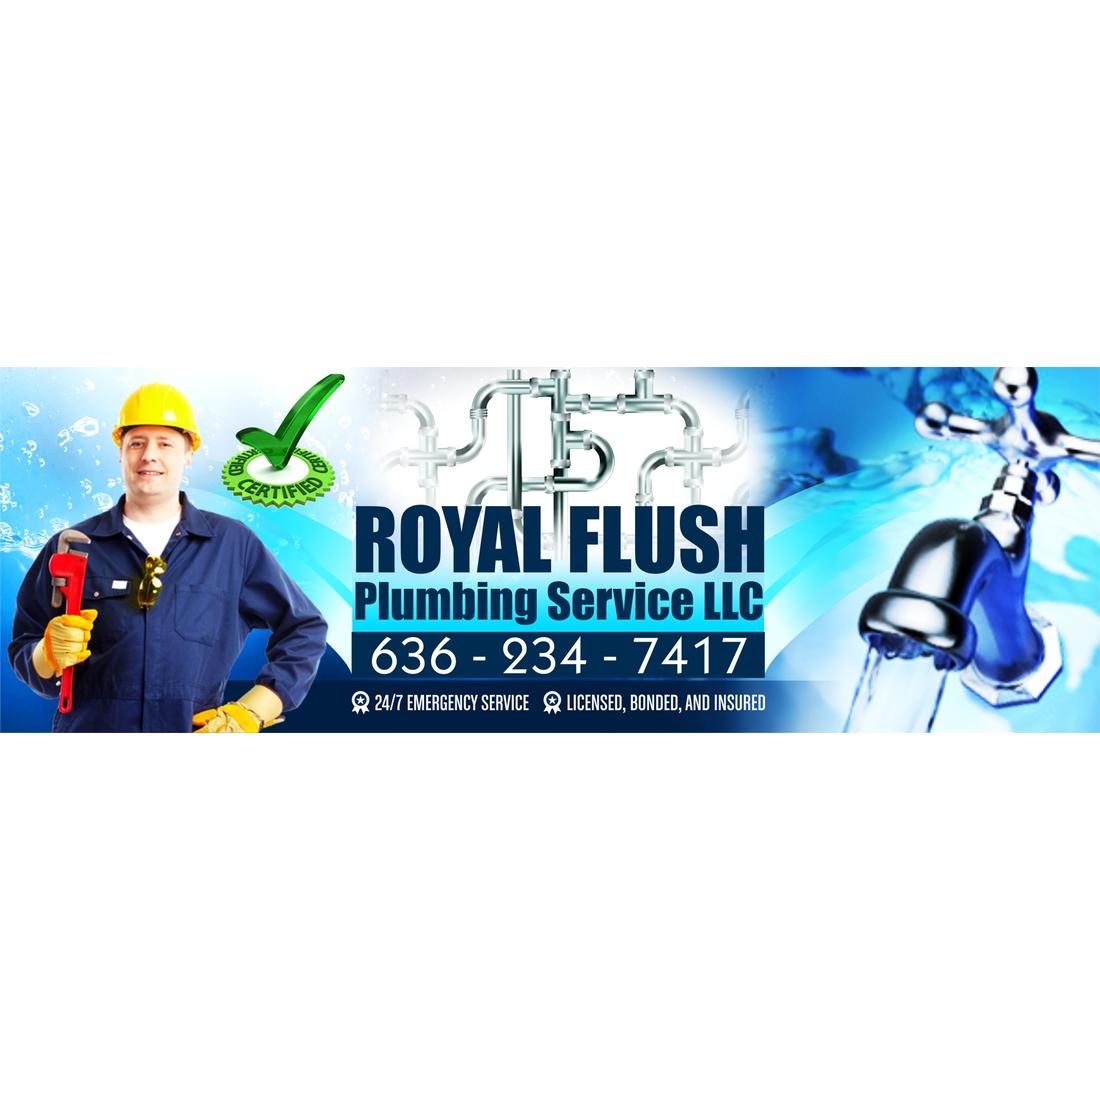 Royal Flush Plumbing Service Llc